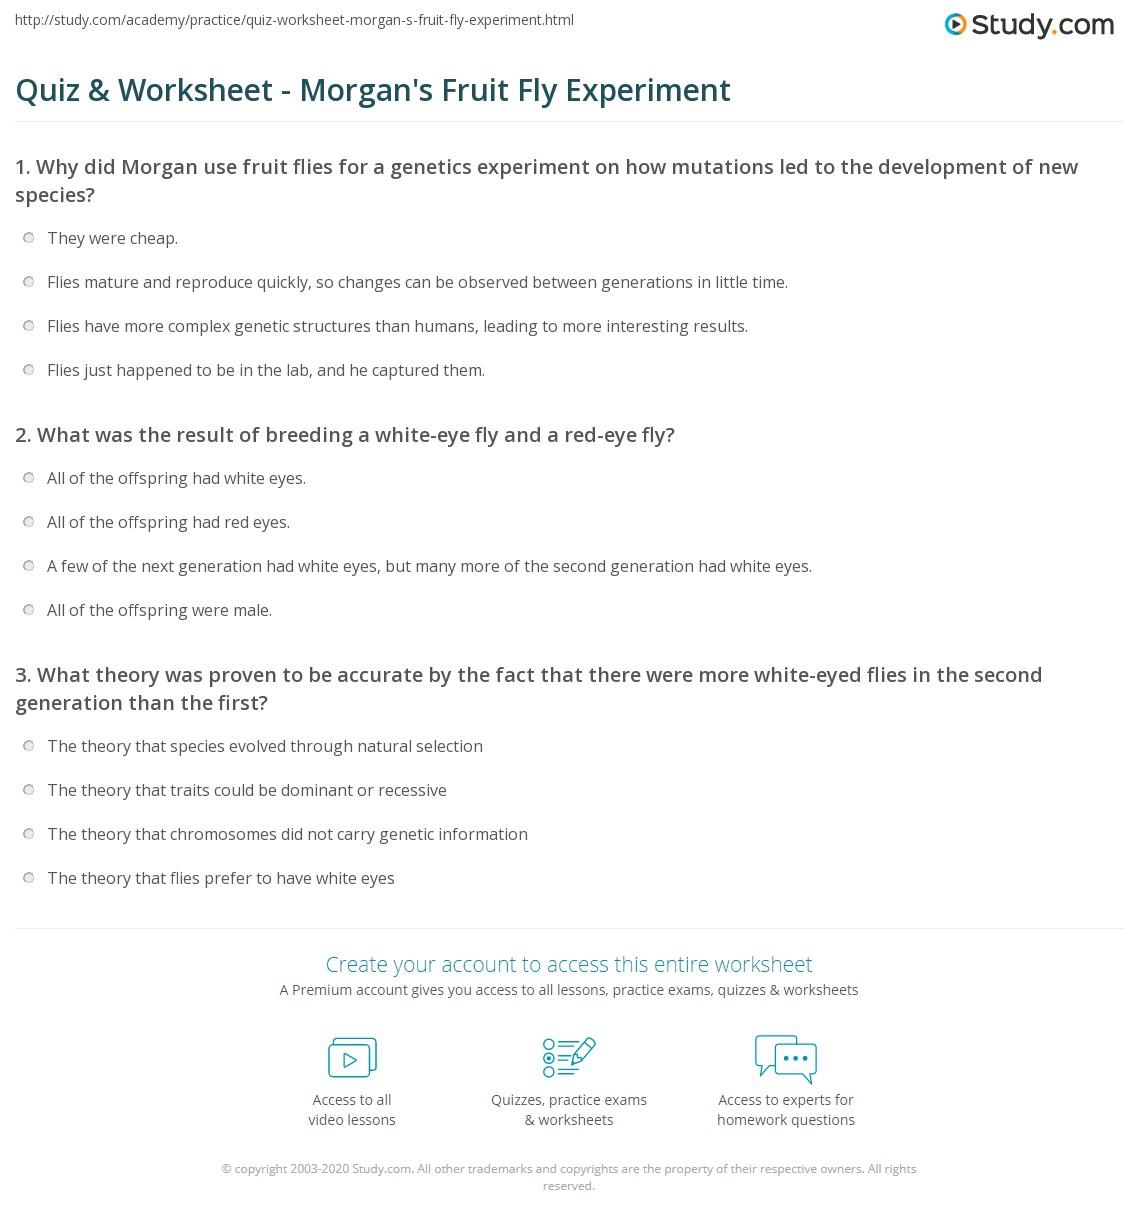 quiz worksheet morgan s fruit fly experiment com print thomas hunt morgan s fruit fly experiment worksheet